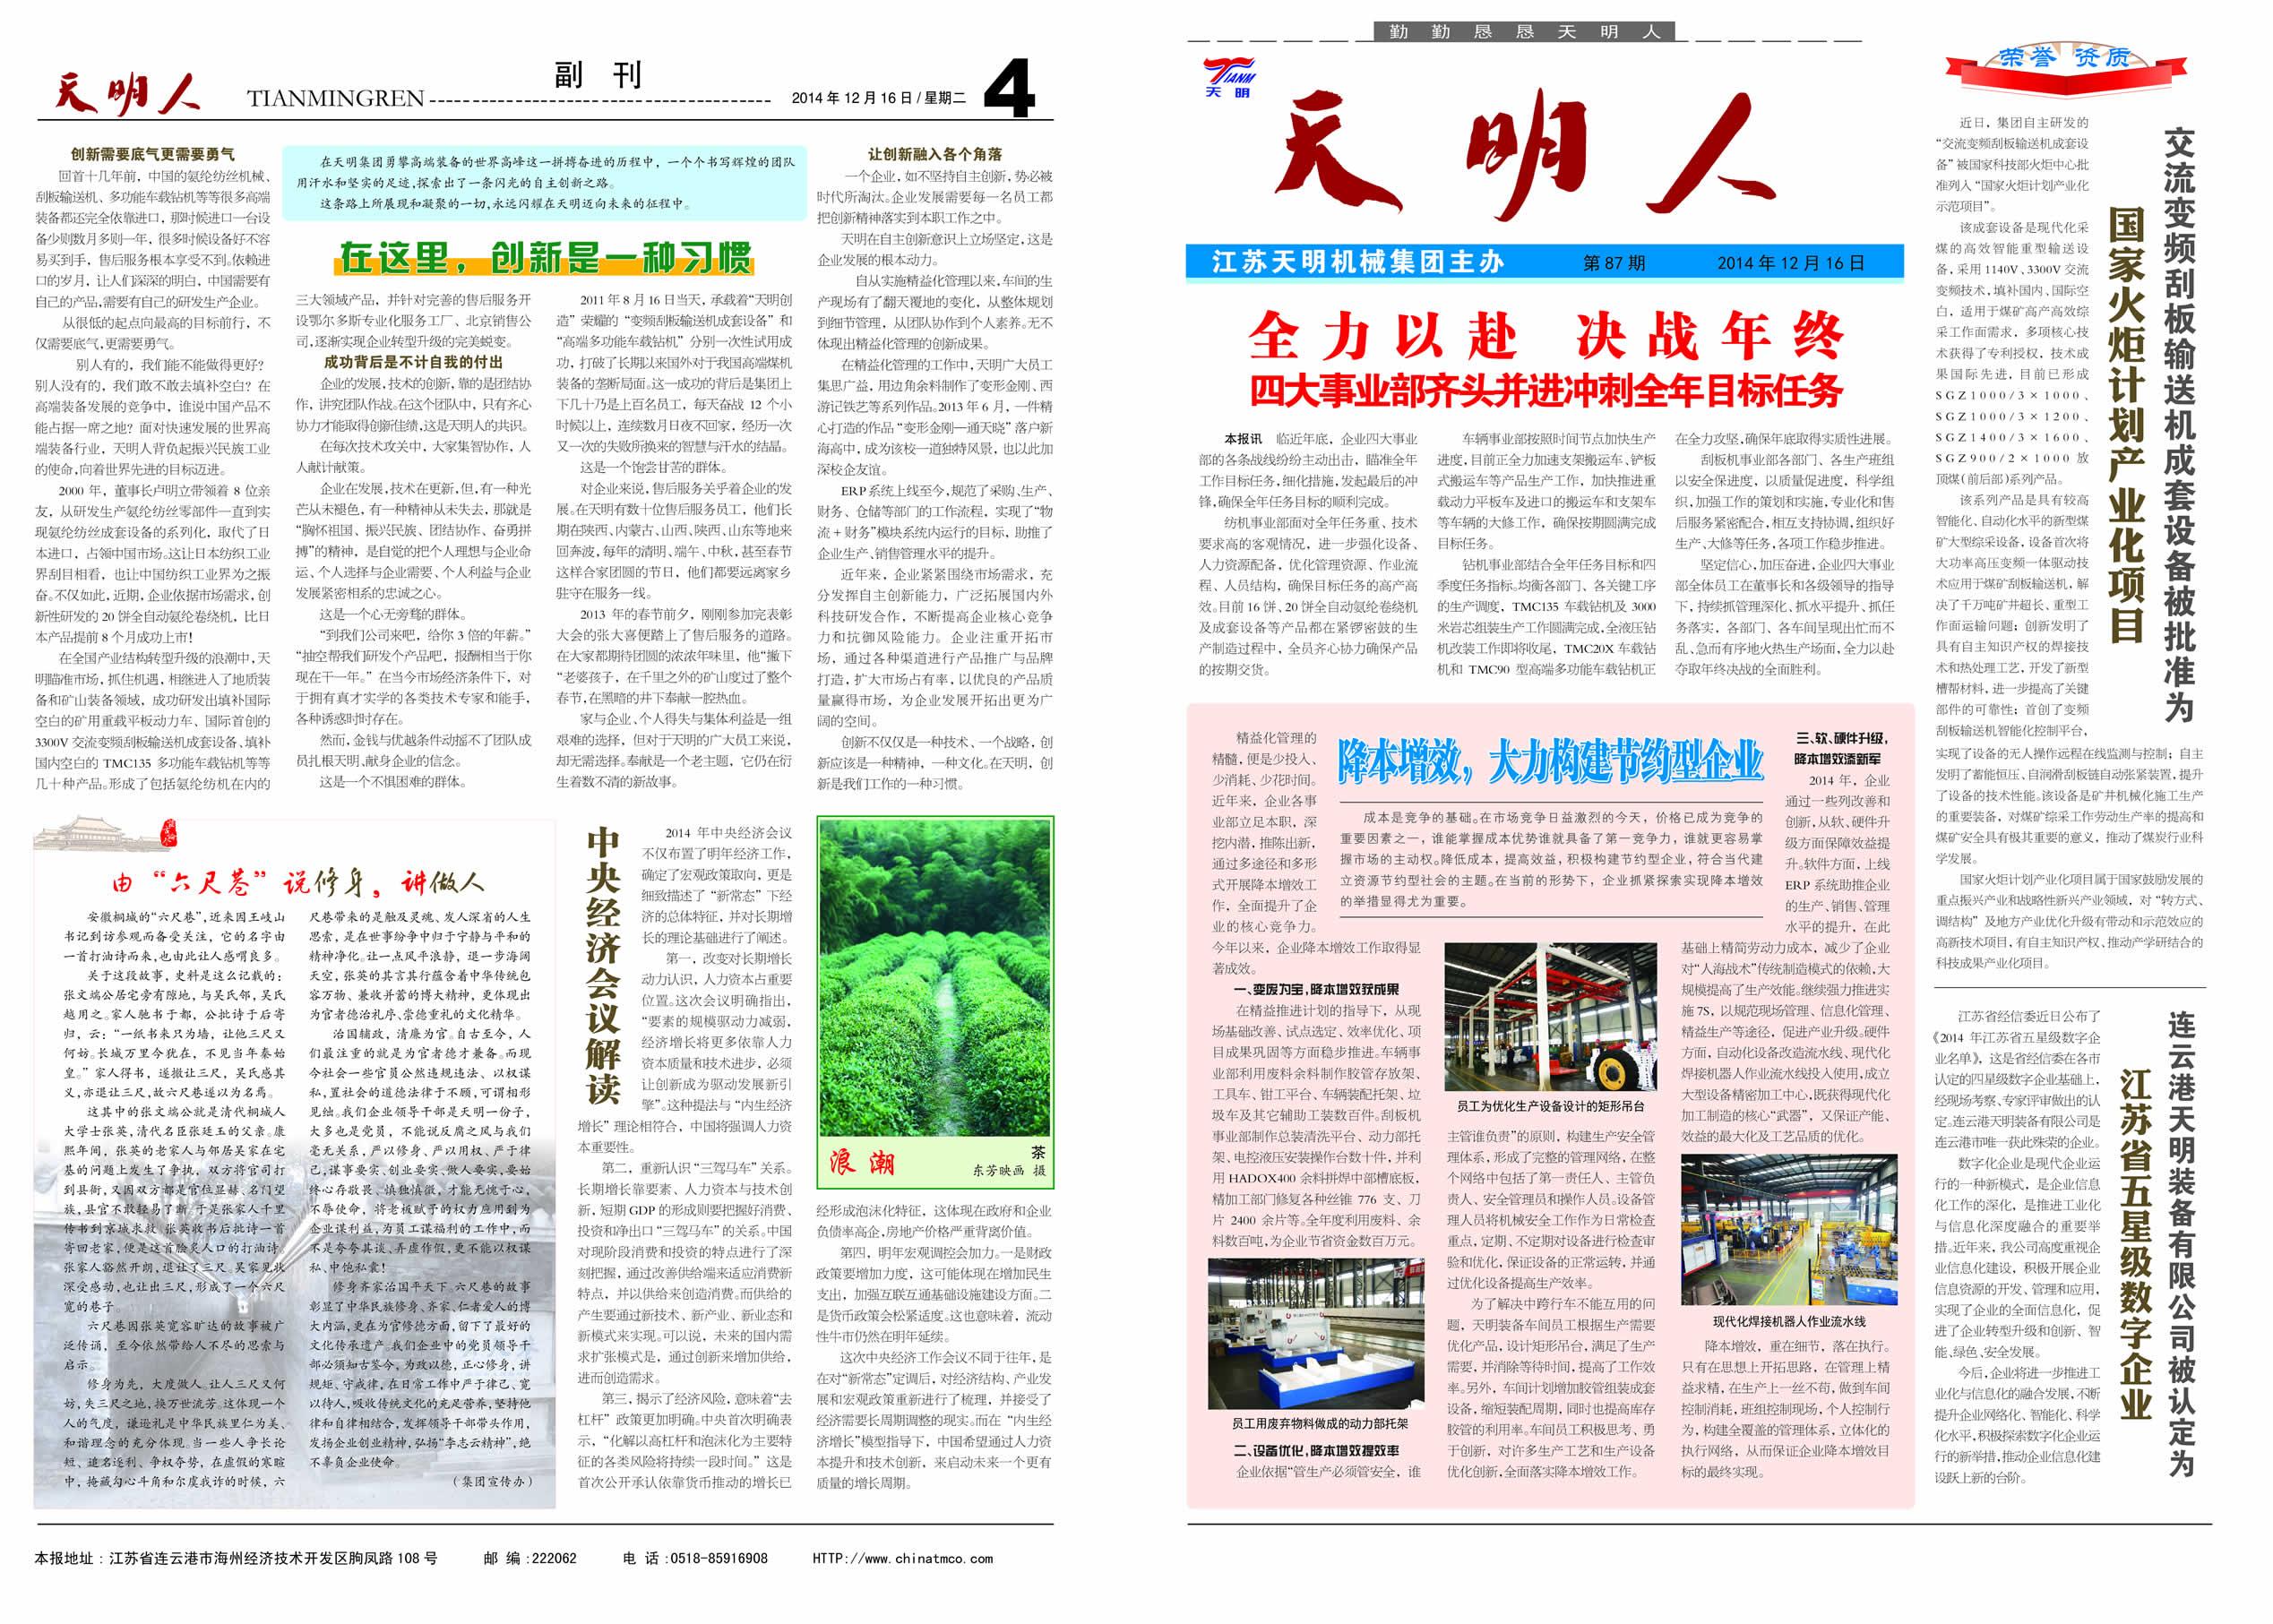 hg711皇冠国际_hg88皇冠国际平台_hg皇冠国际vip首页人2014第12期(总第87期)1、4版